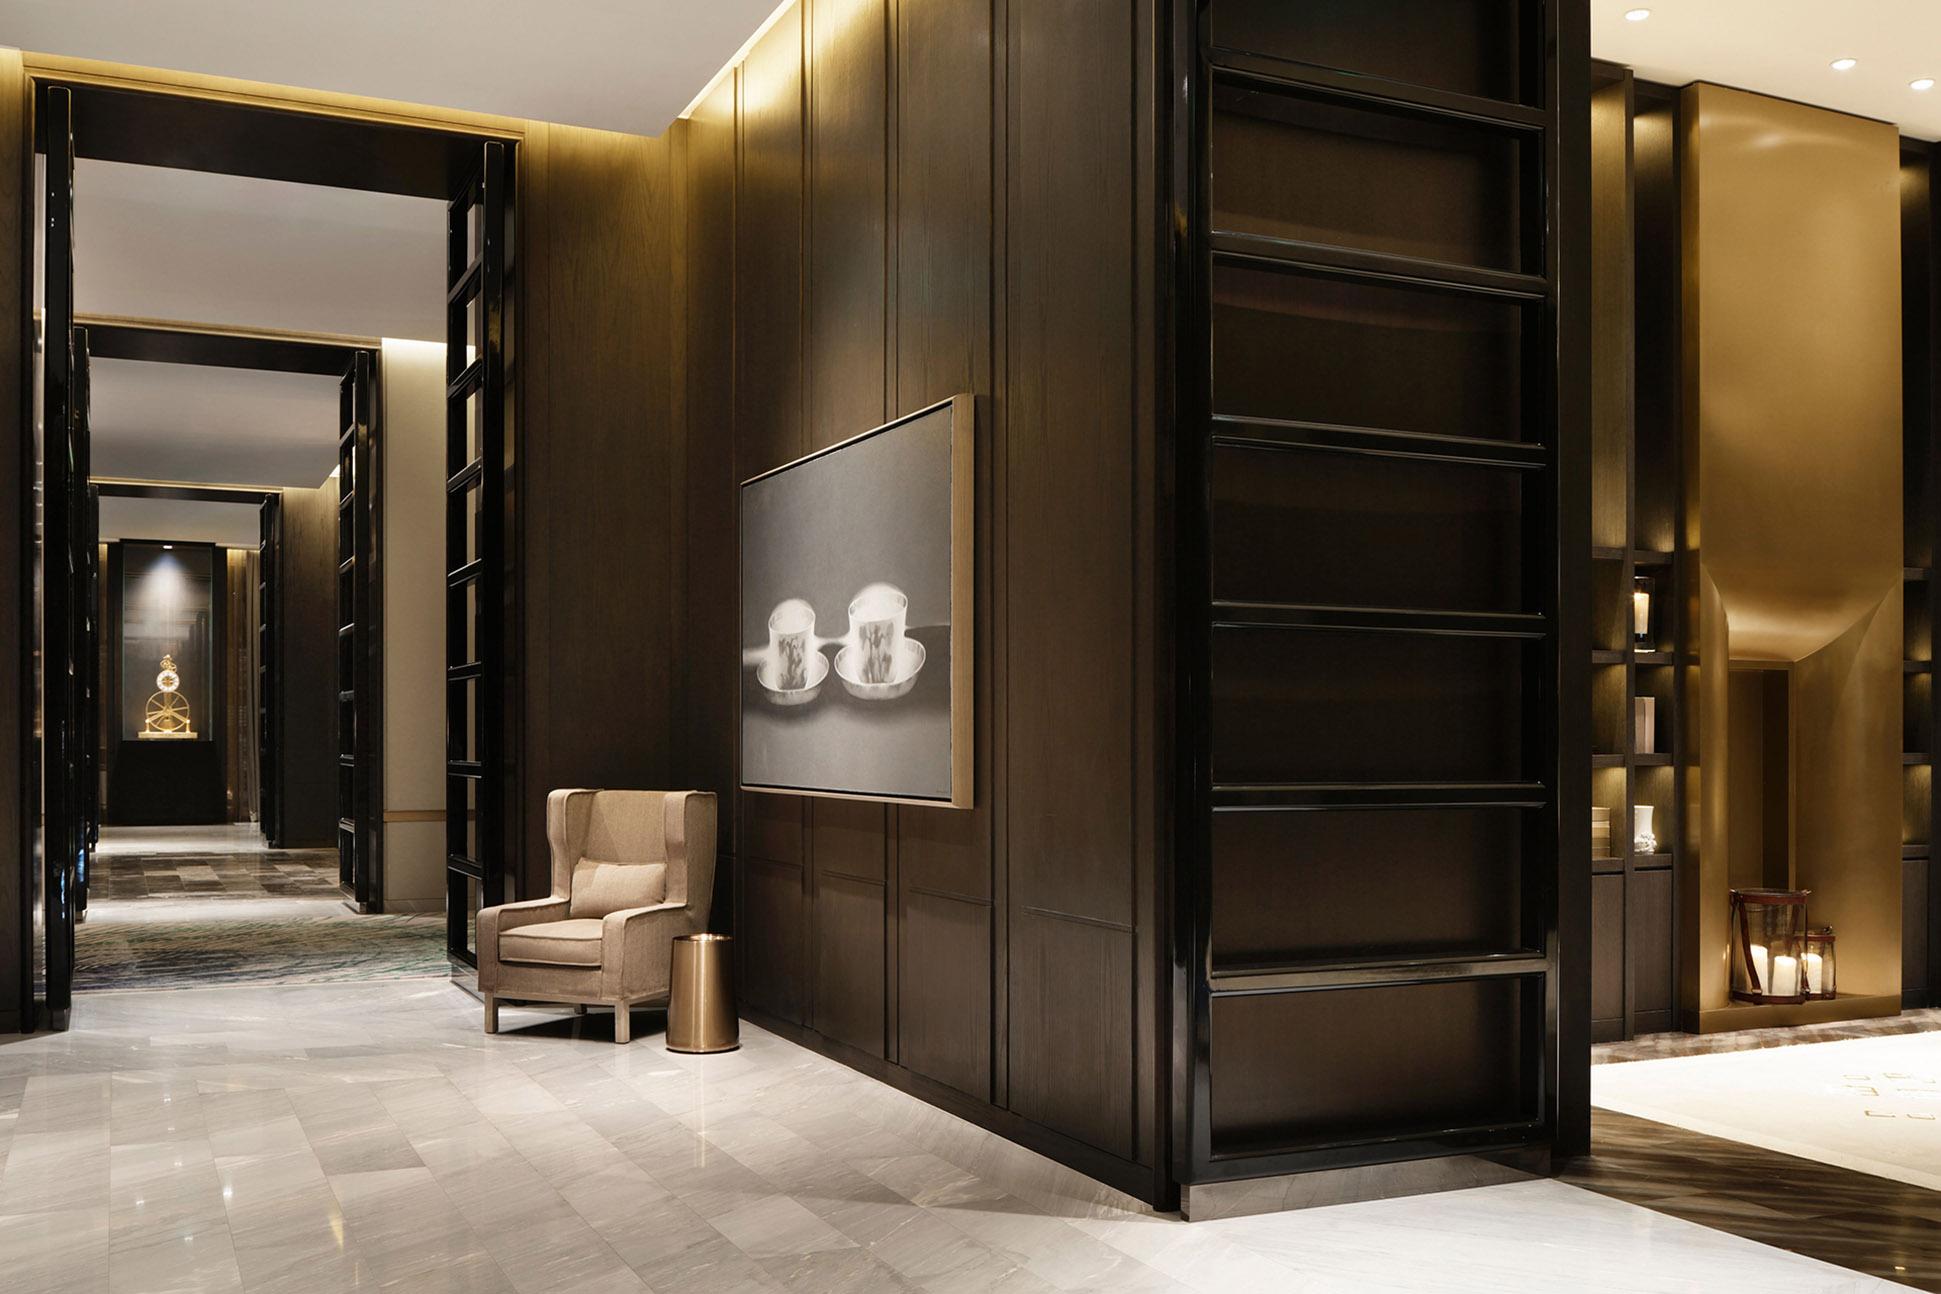 Gruppo Tosco Marmi Waldorf Astoria Beijing 1